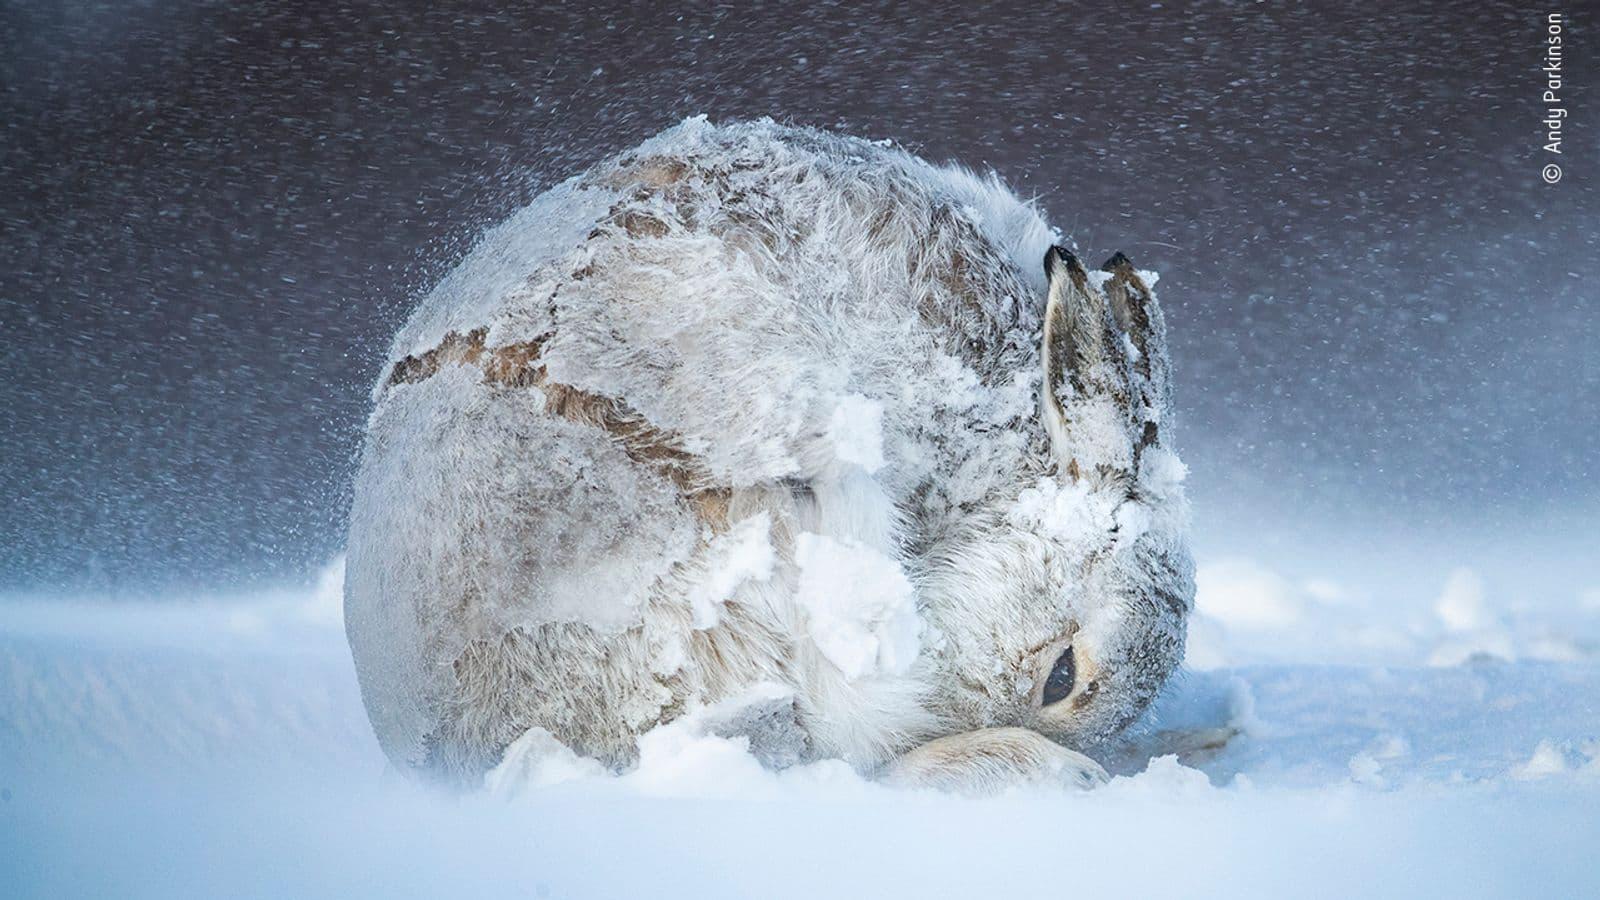 Hare-Ball-di-Andy-Parkinson-min